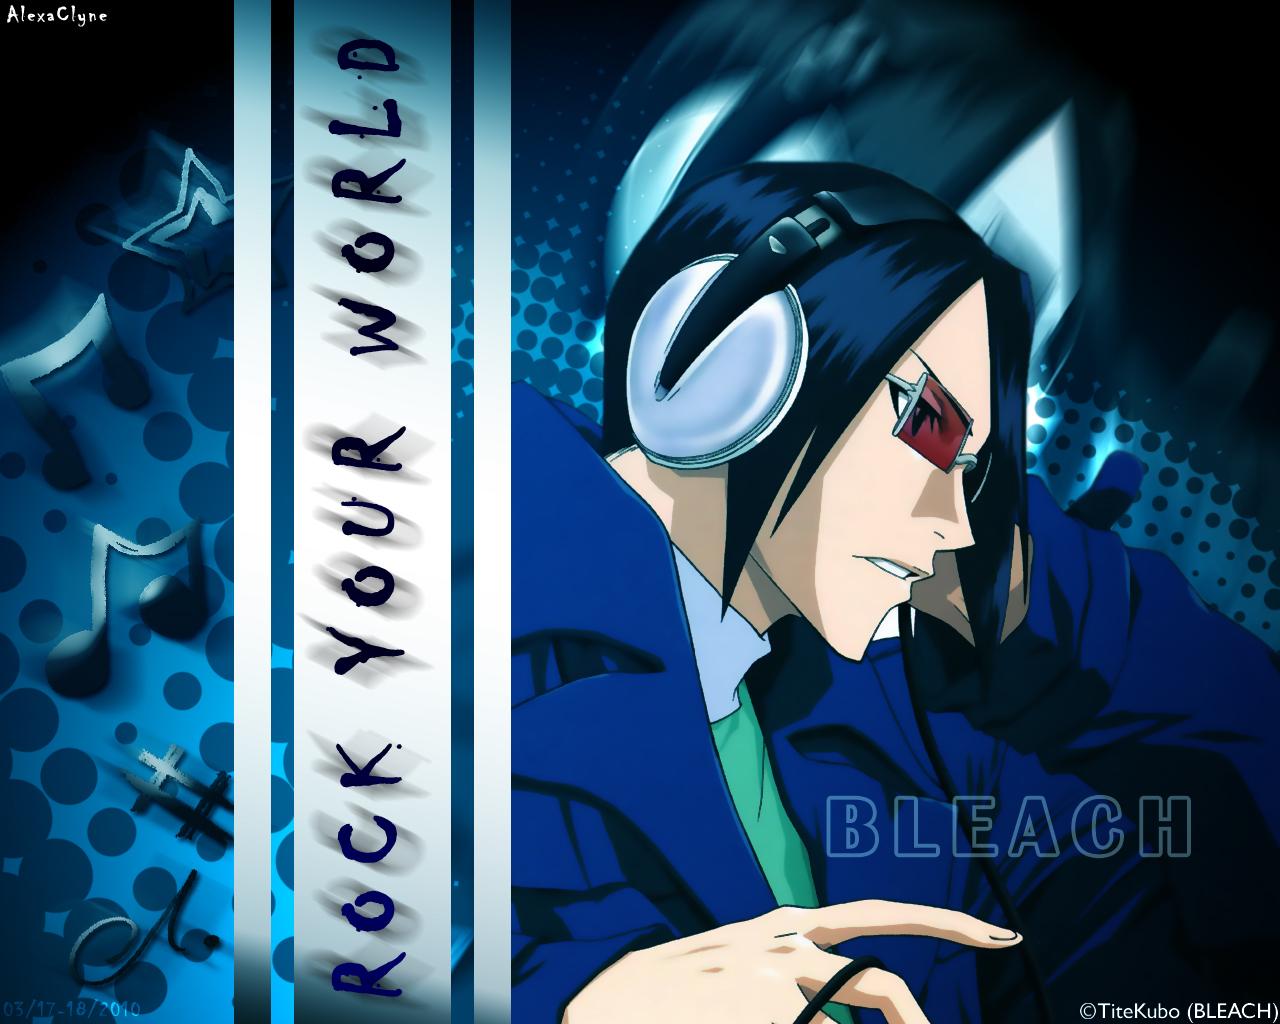 Bleach Anime Wallpaper # 92